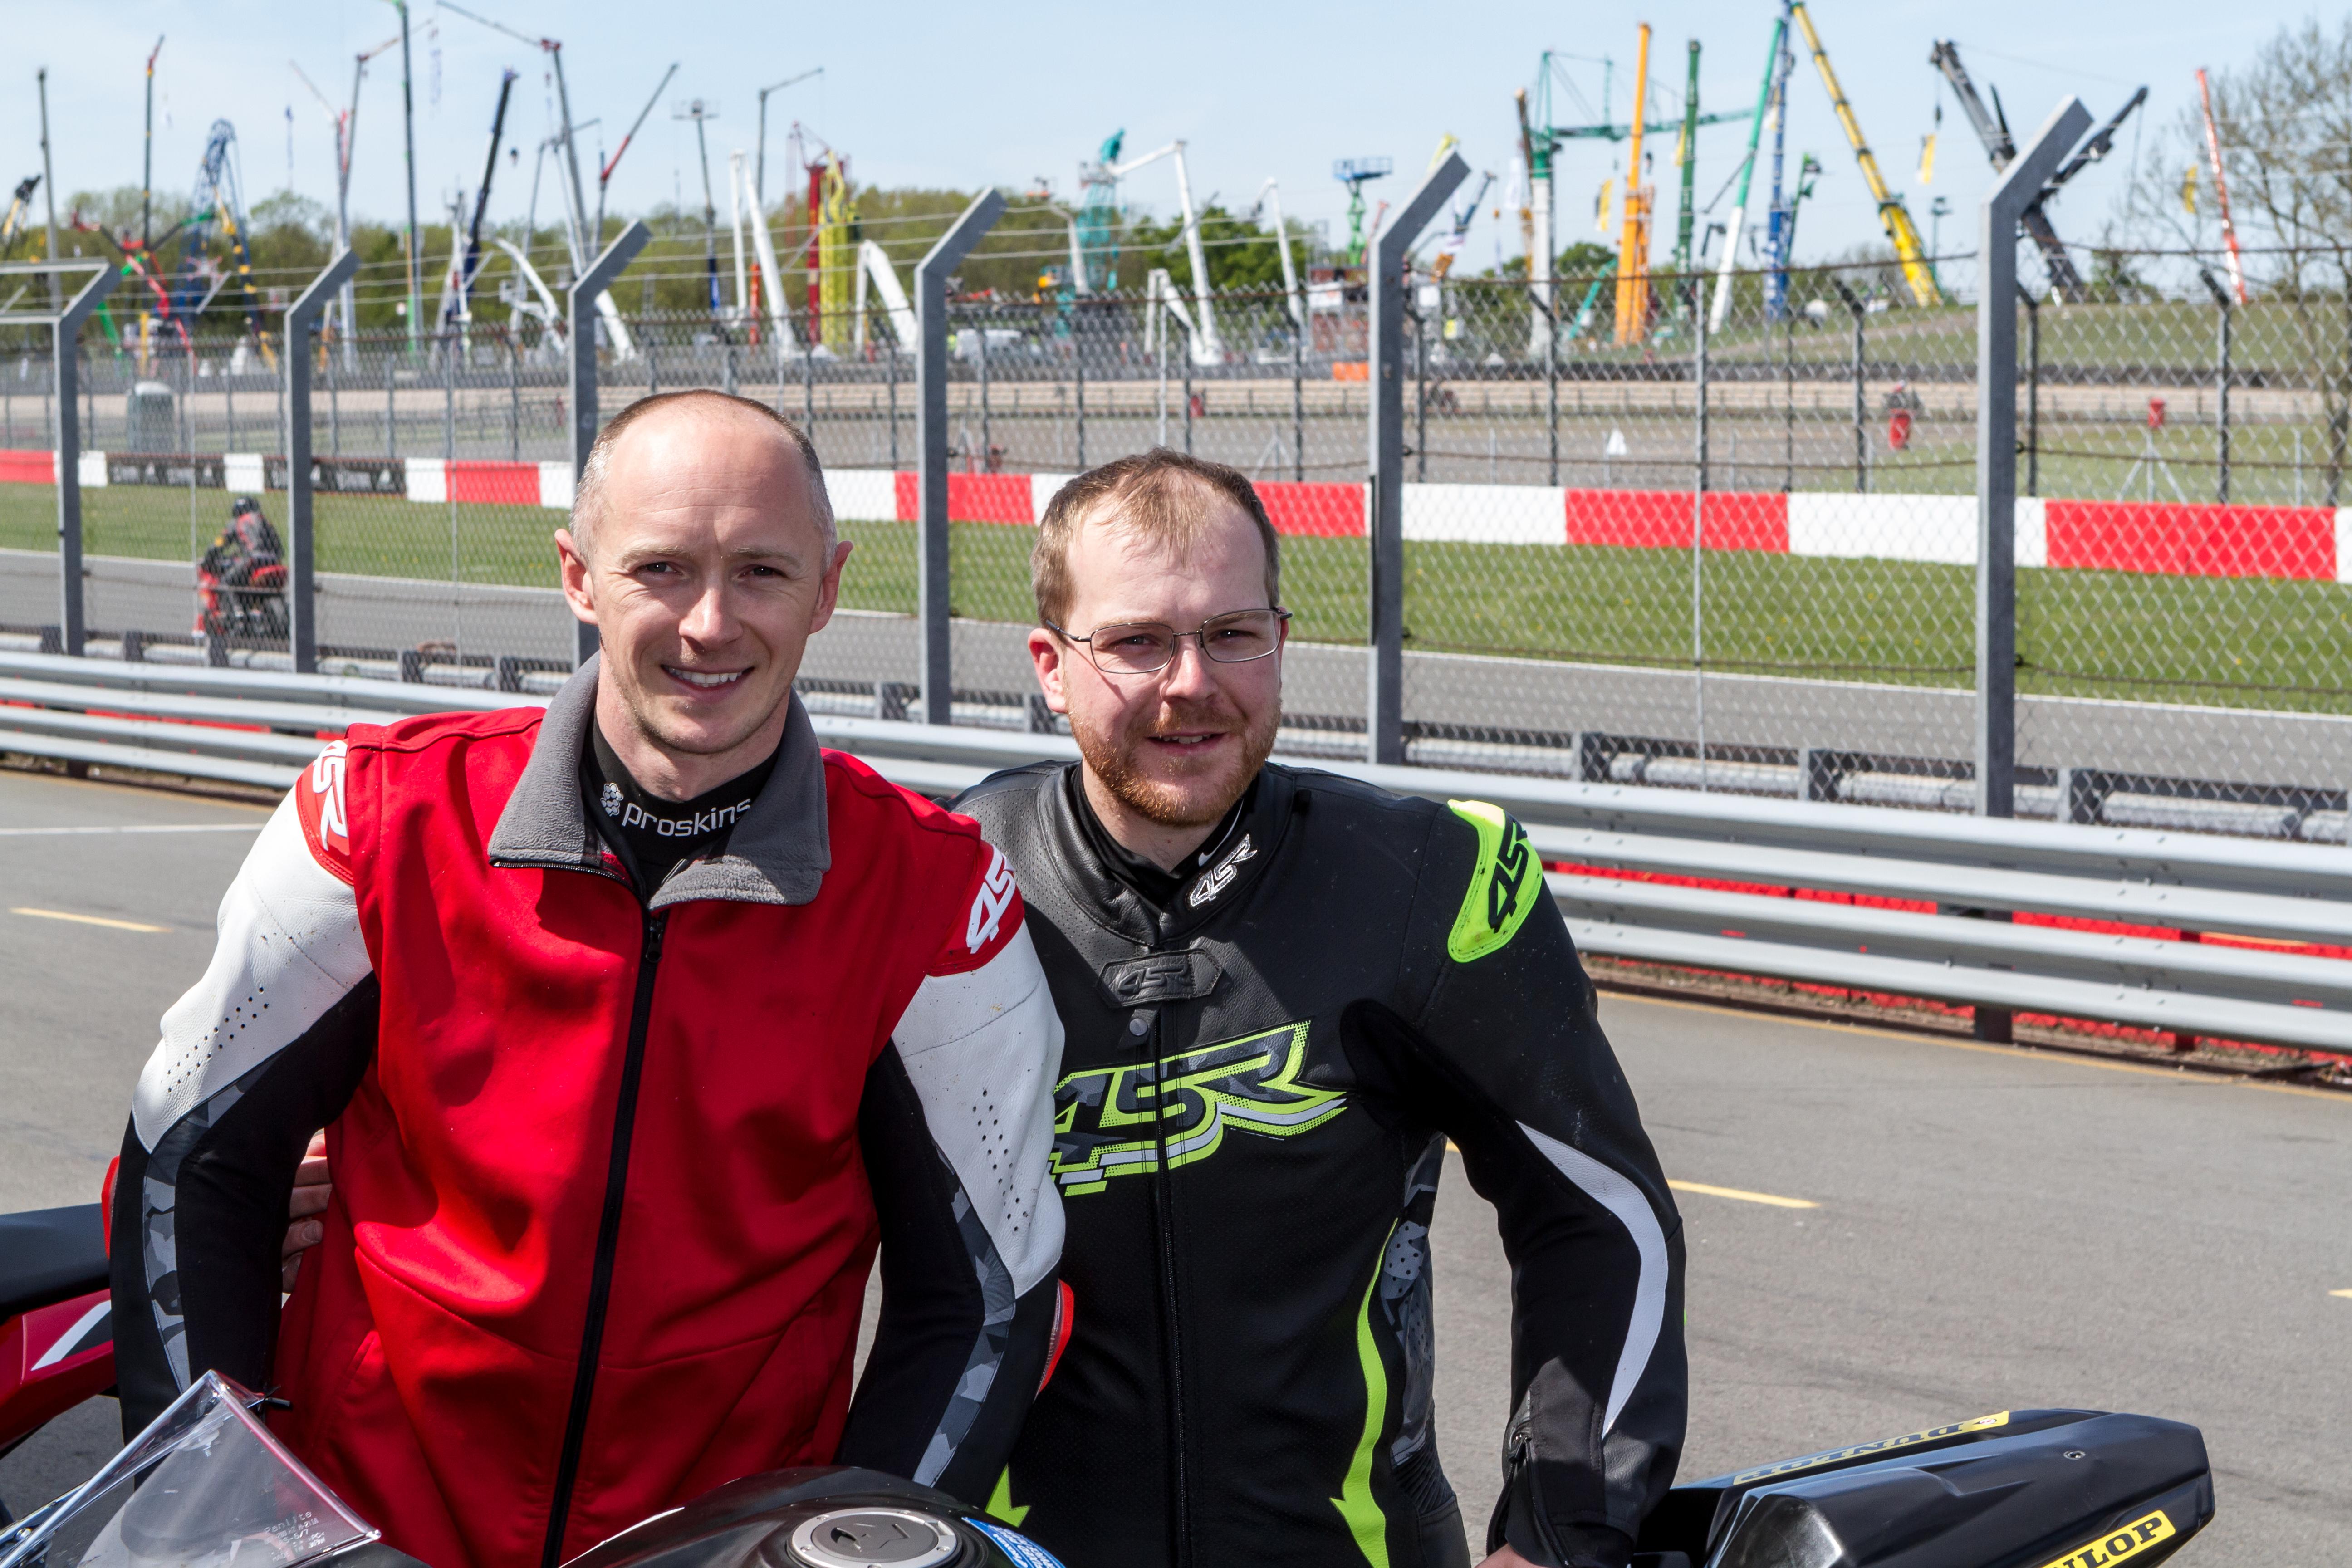 4SR riders